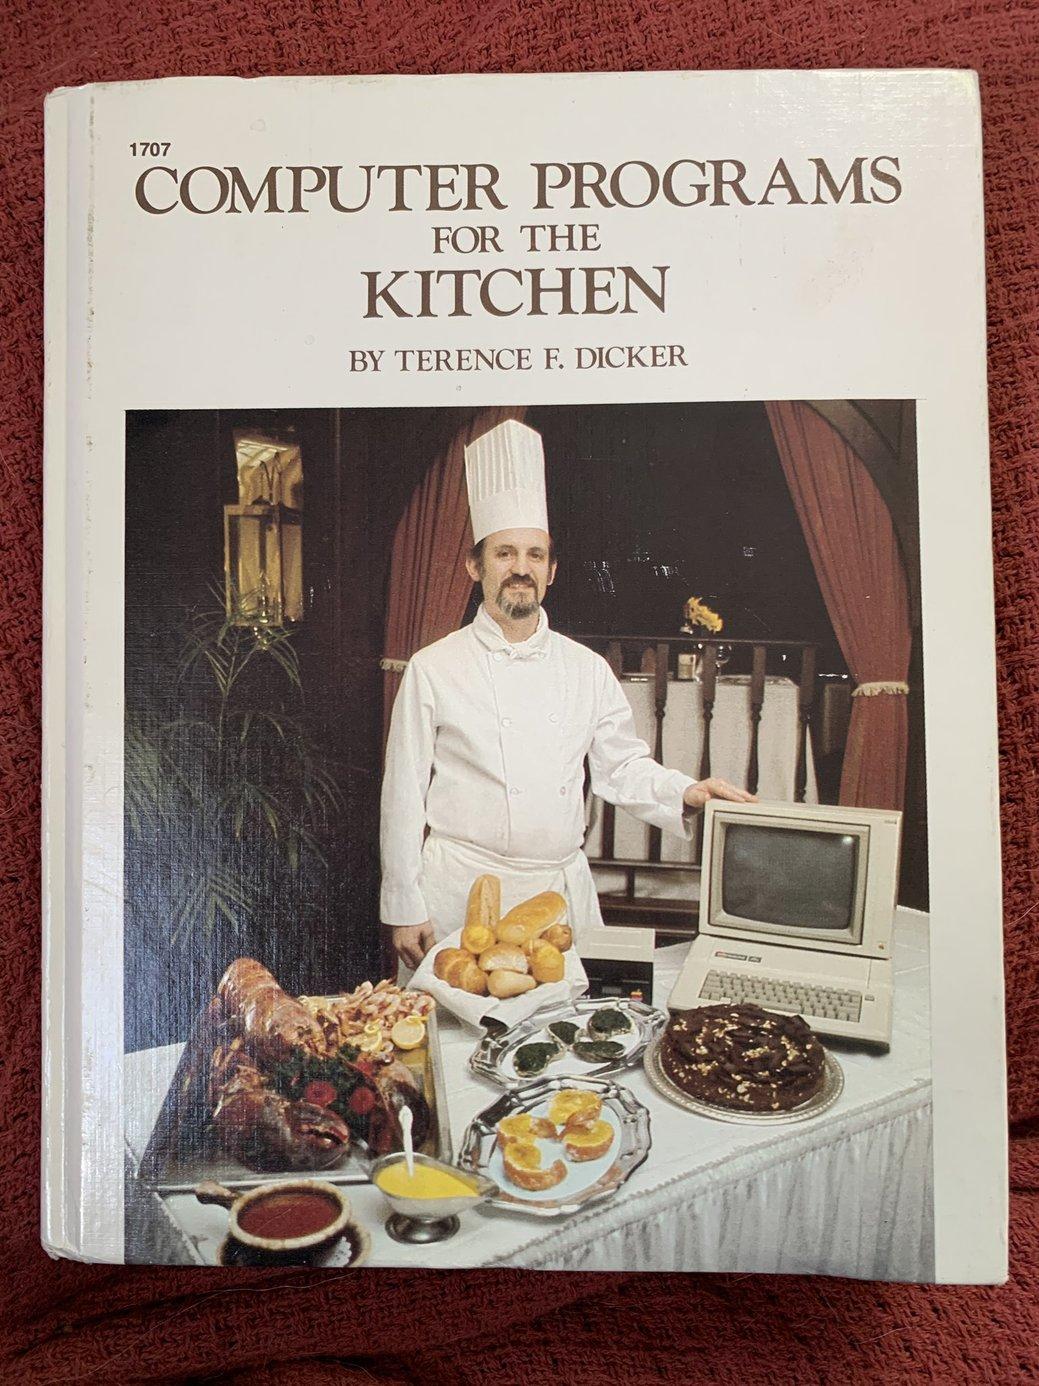 Computerprograms for the kitchen.